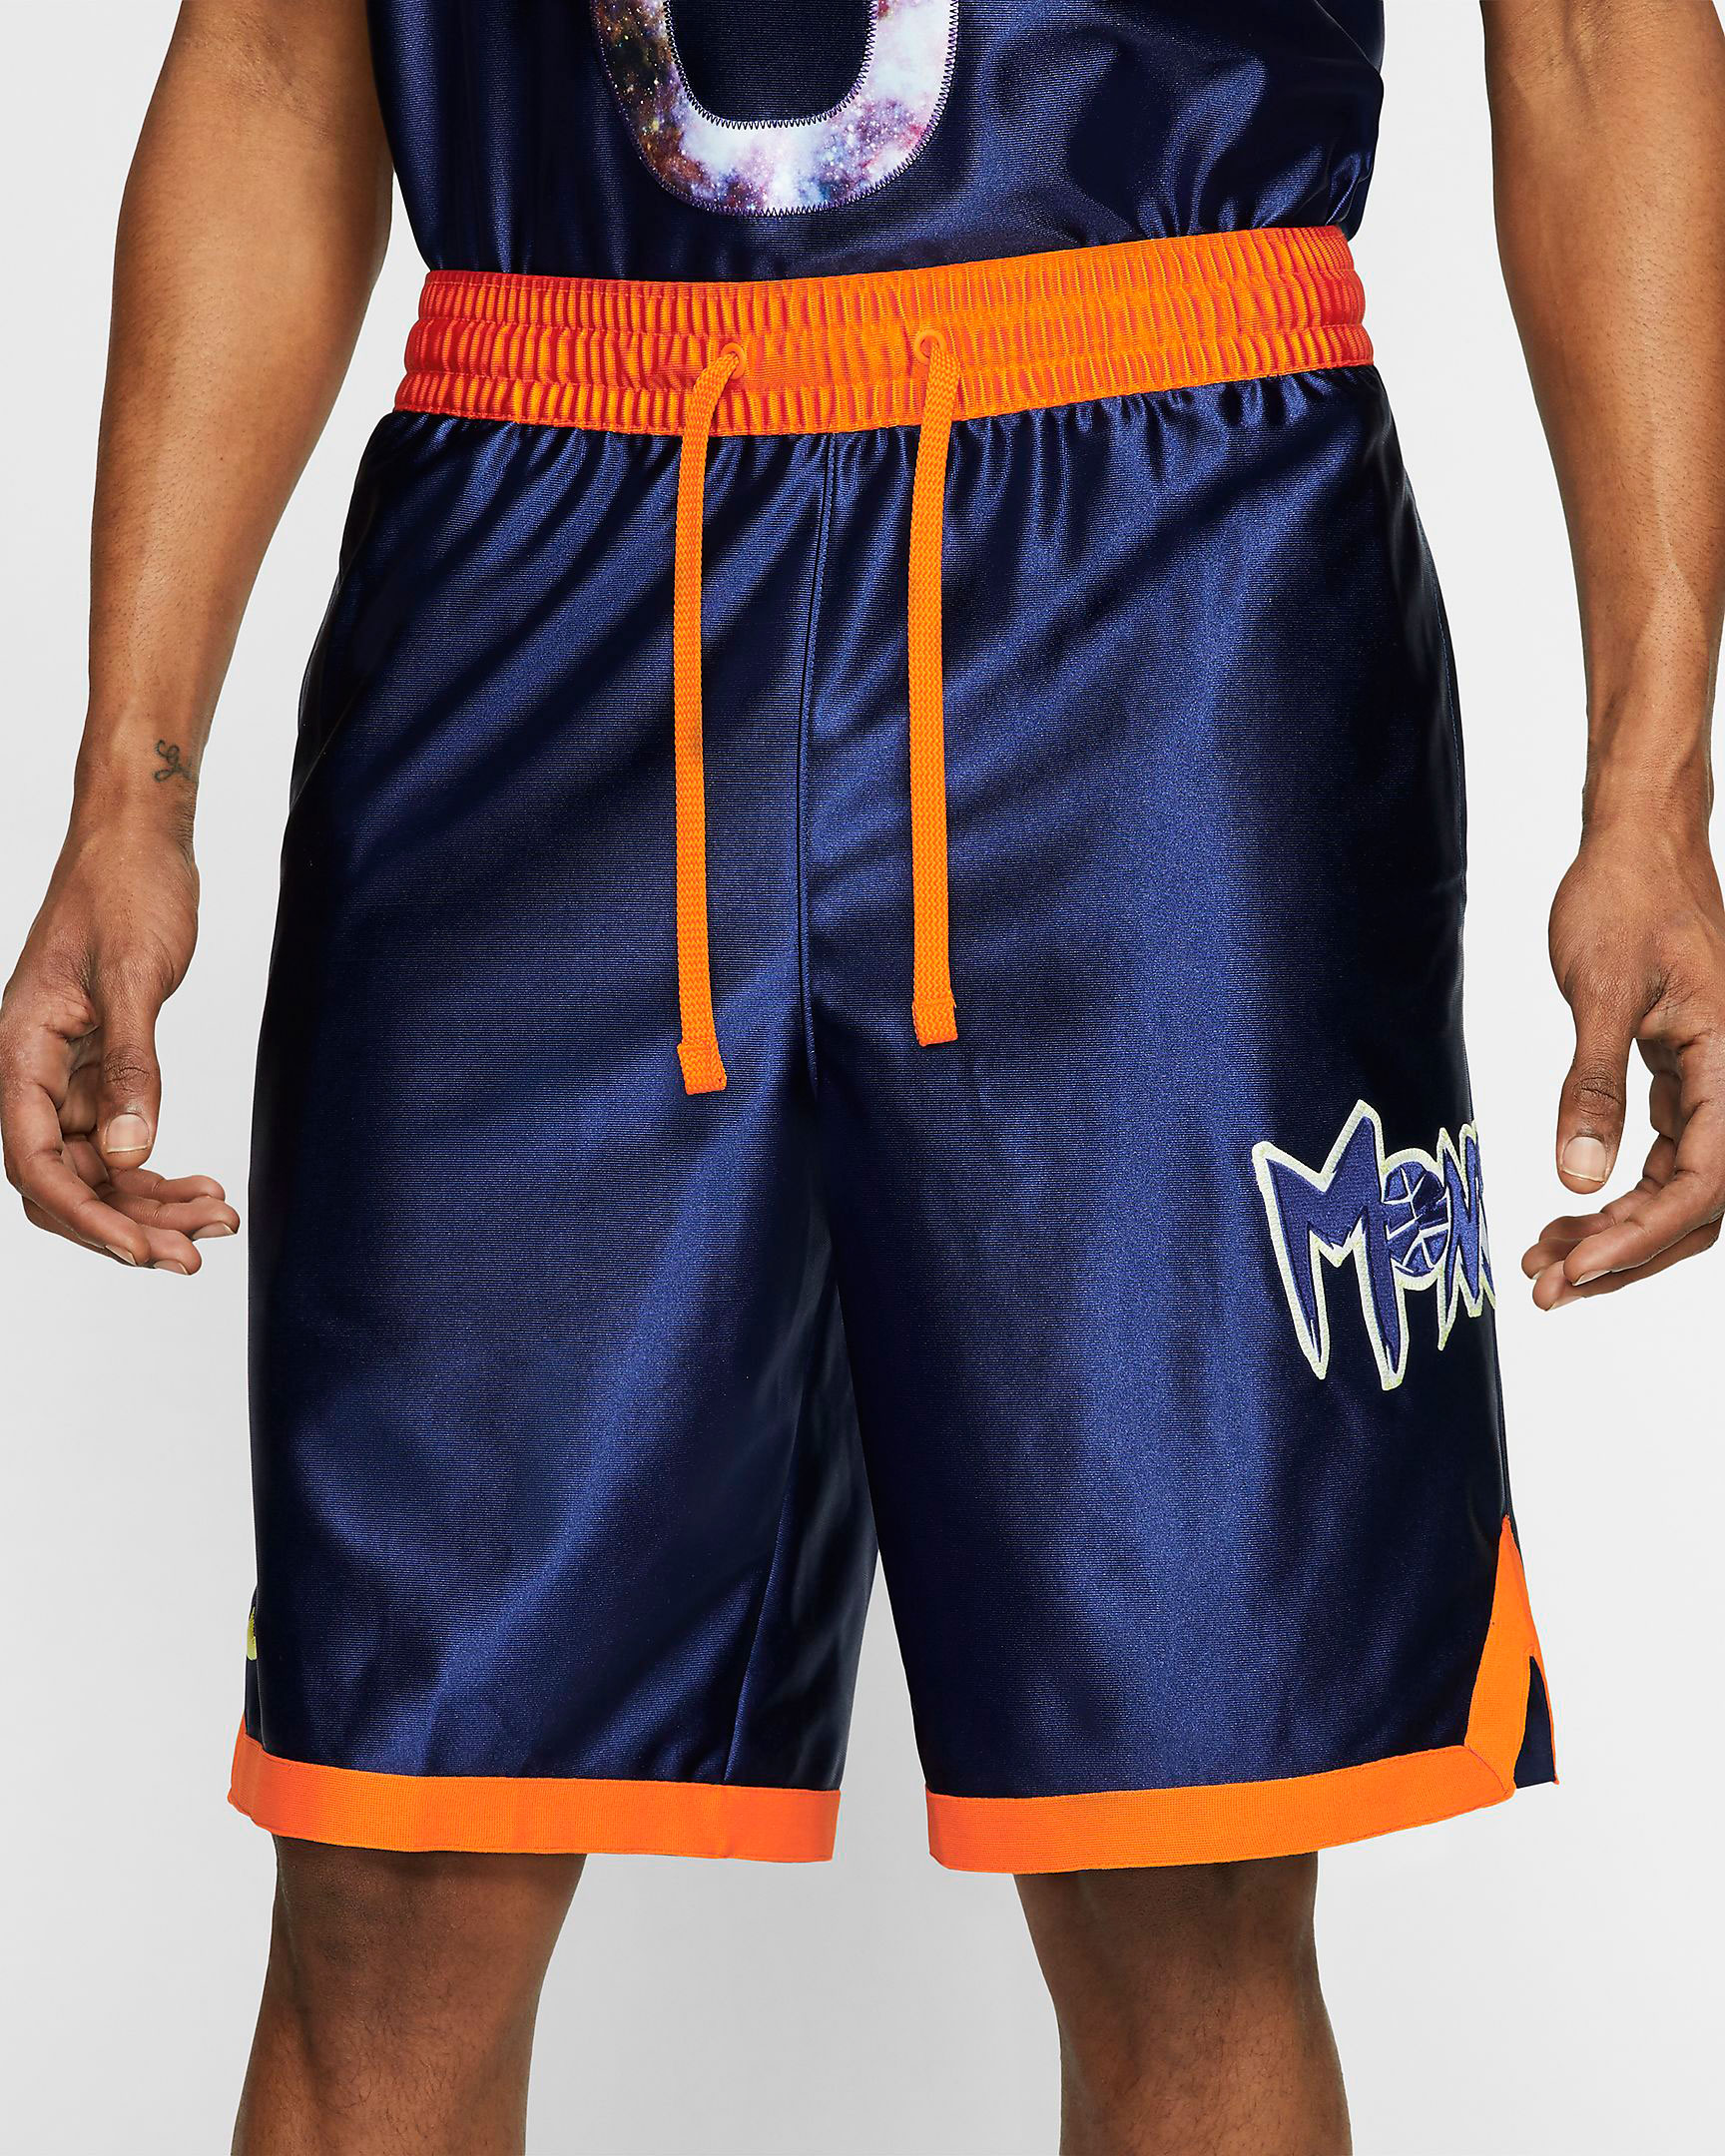 nike-lebron-monstars-shorts-1